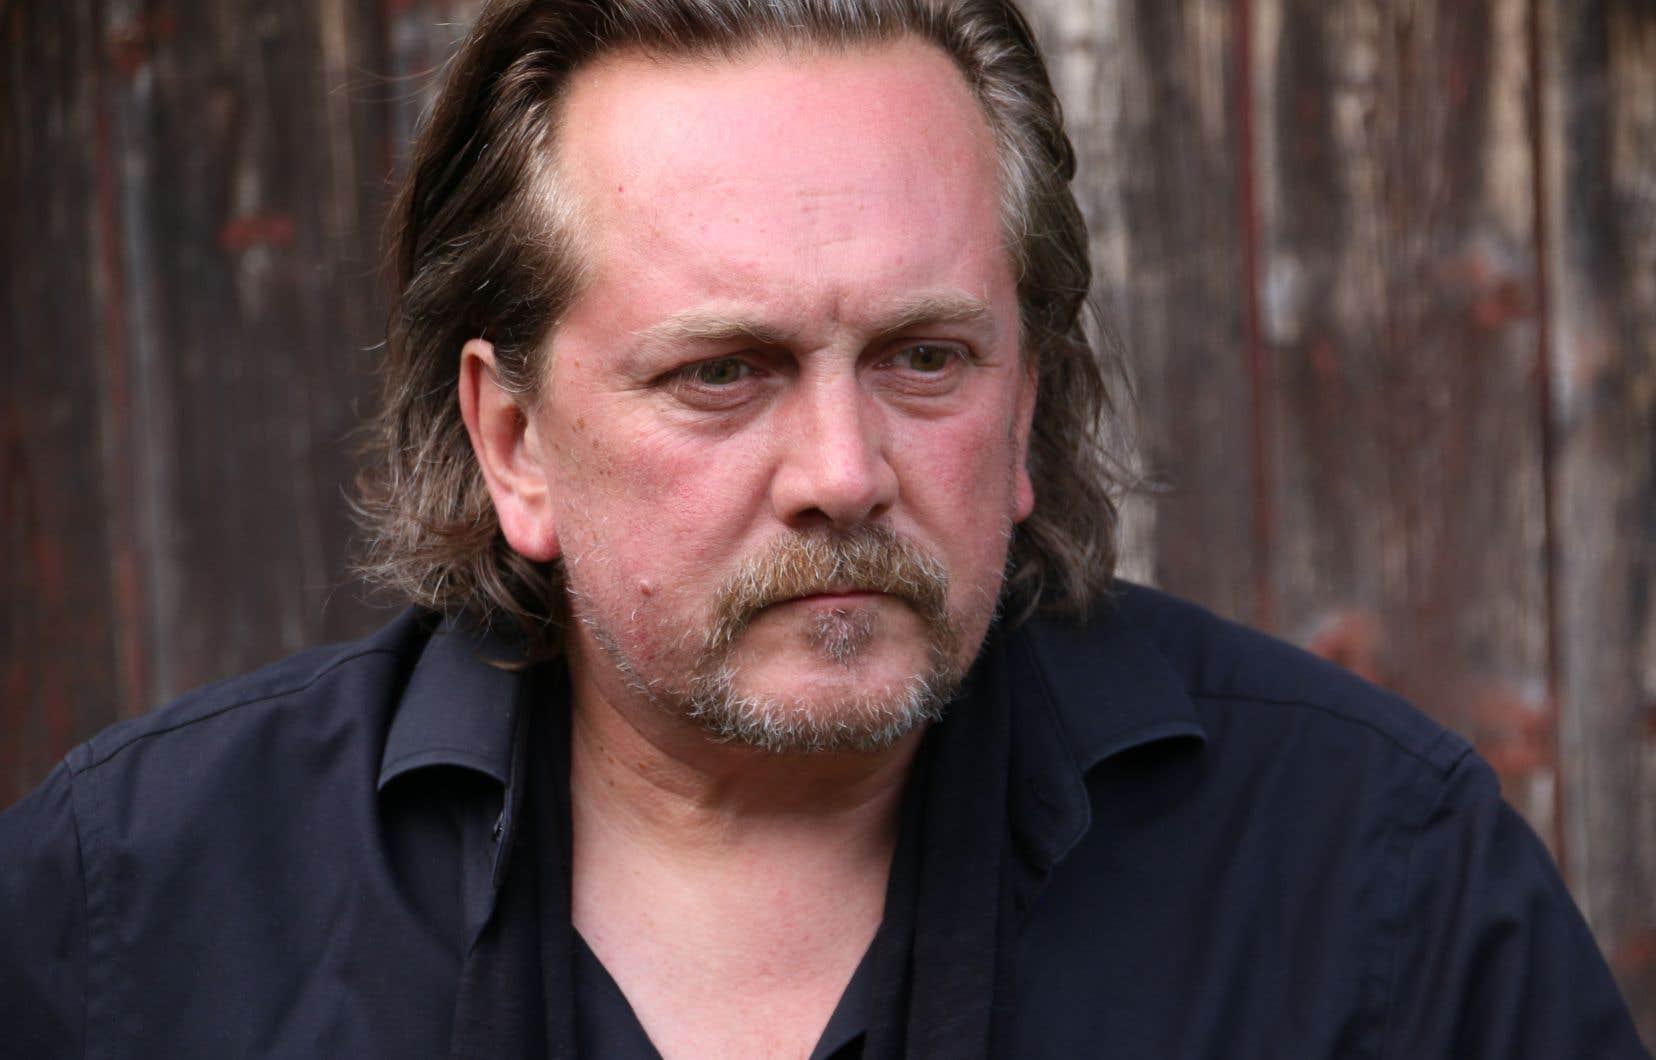 Carl Bastien